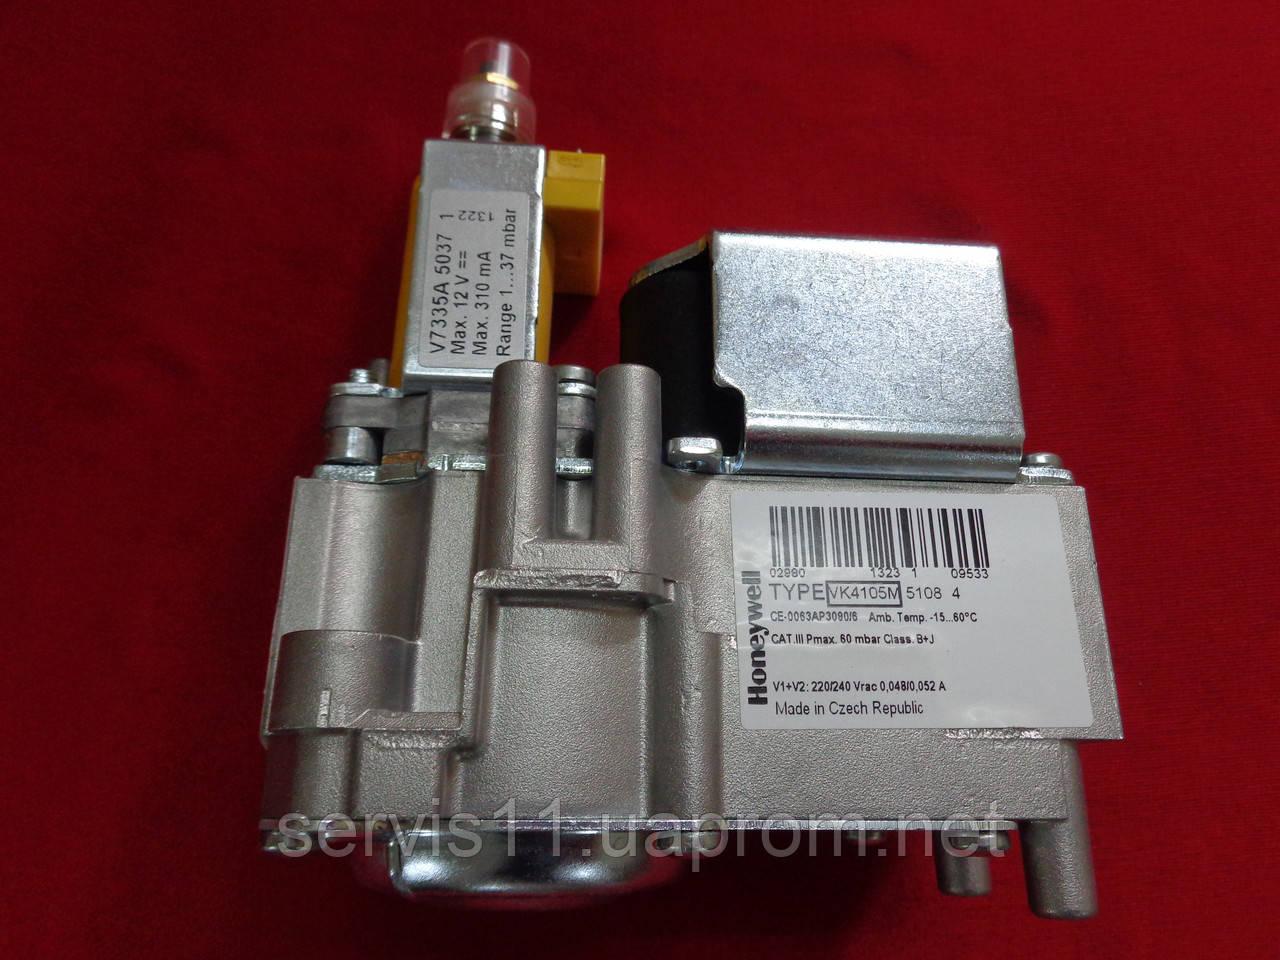 Газовый клапан Honeywell VK 4105 M(5108 4) BAXI/WESTEN 5665210